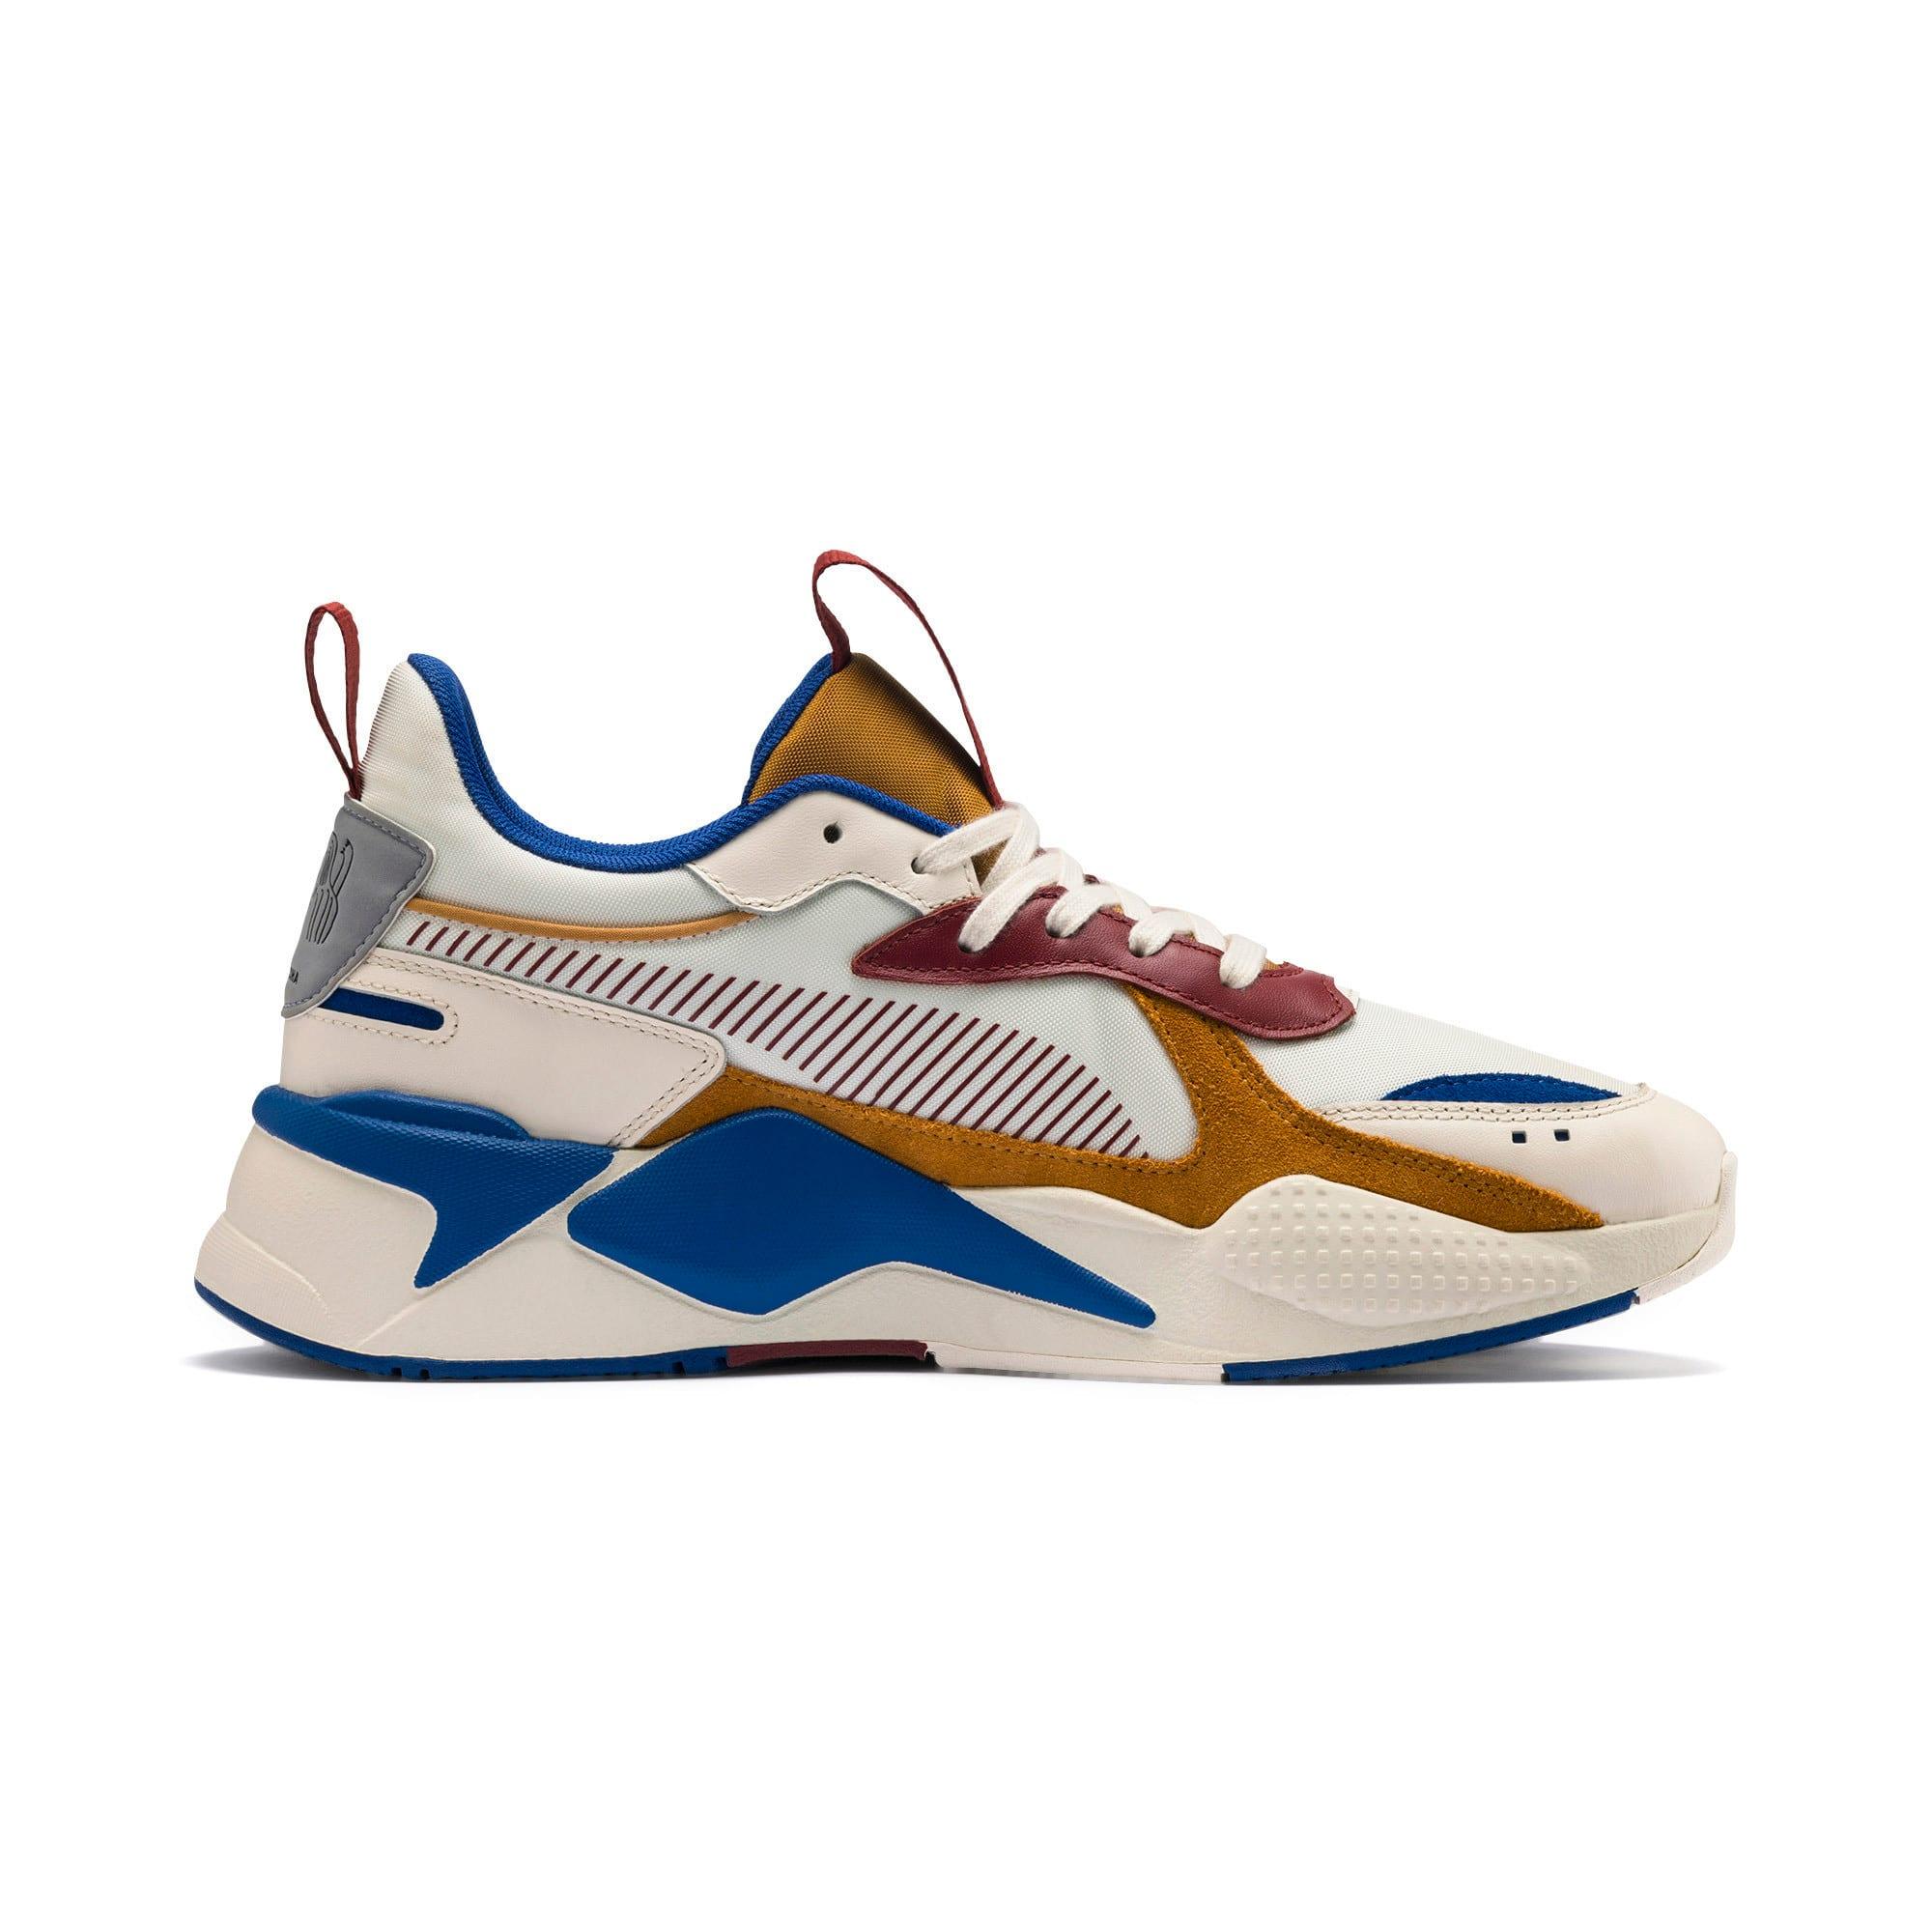 Miniatura 7 de Zapatos deportivos PUMA x TYAKASHA RS-X, Whisper White-Fired Brick, mediano